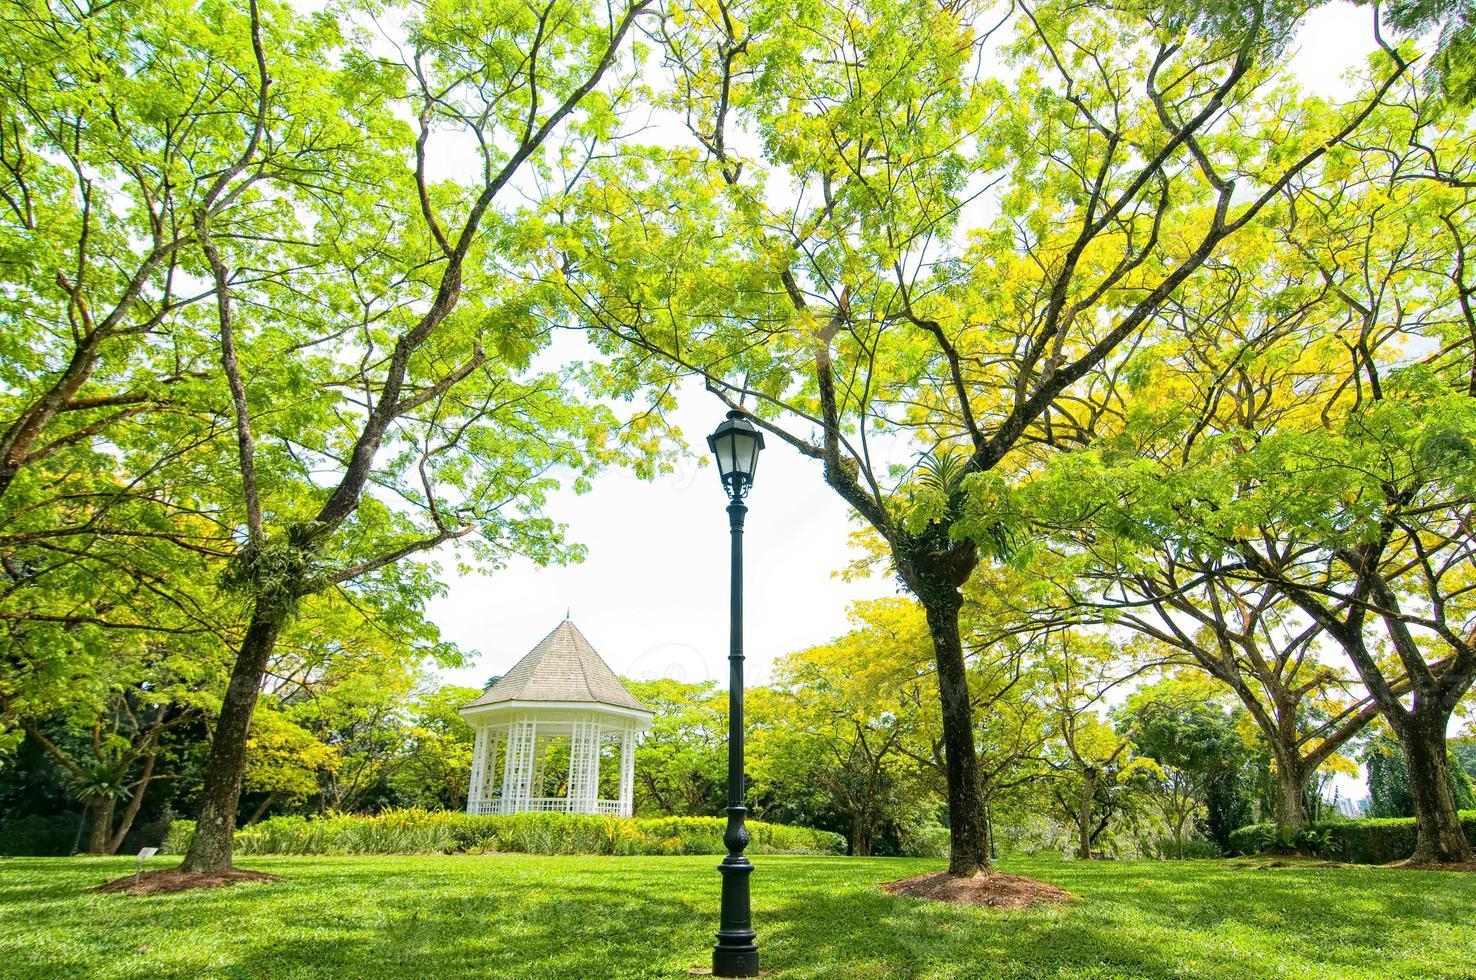 jardins botânicos de cingapura, cingapura foto